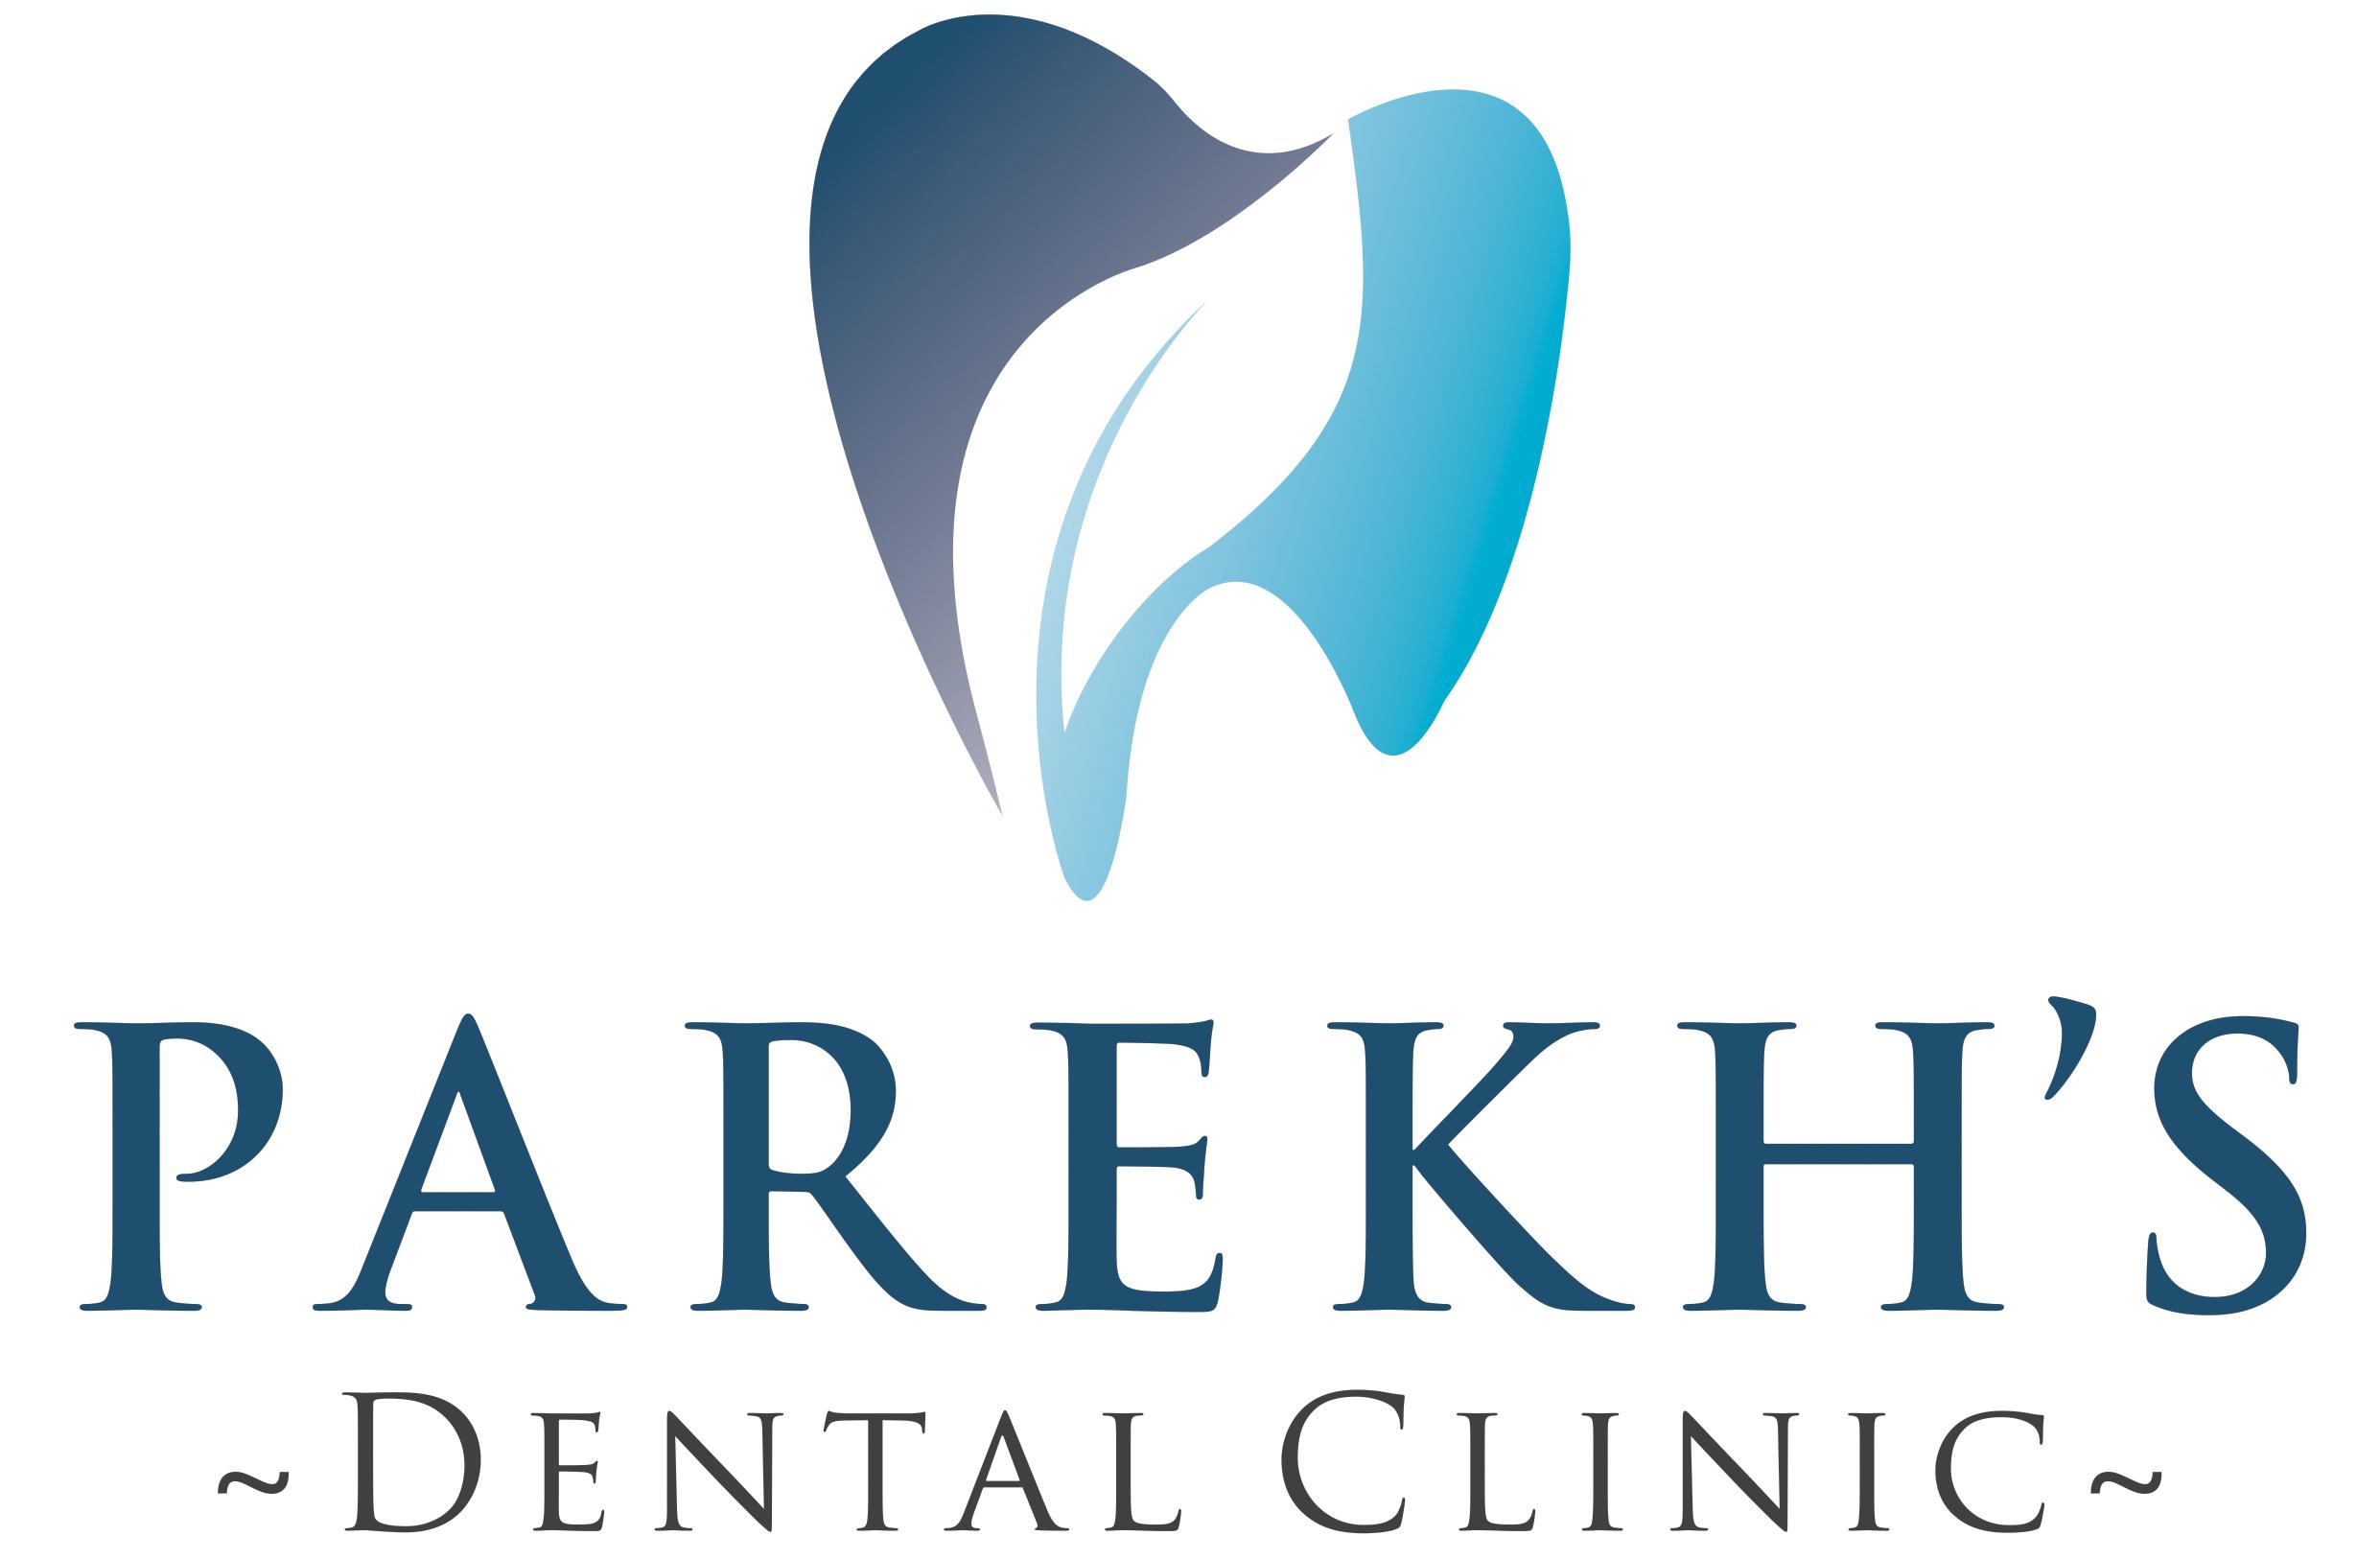 Parekh's Dental Clinic